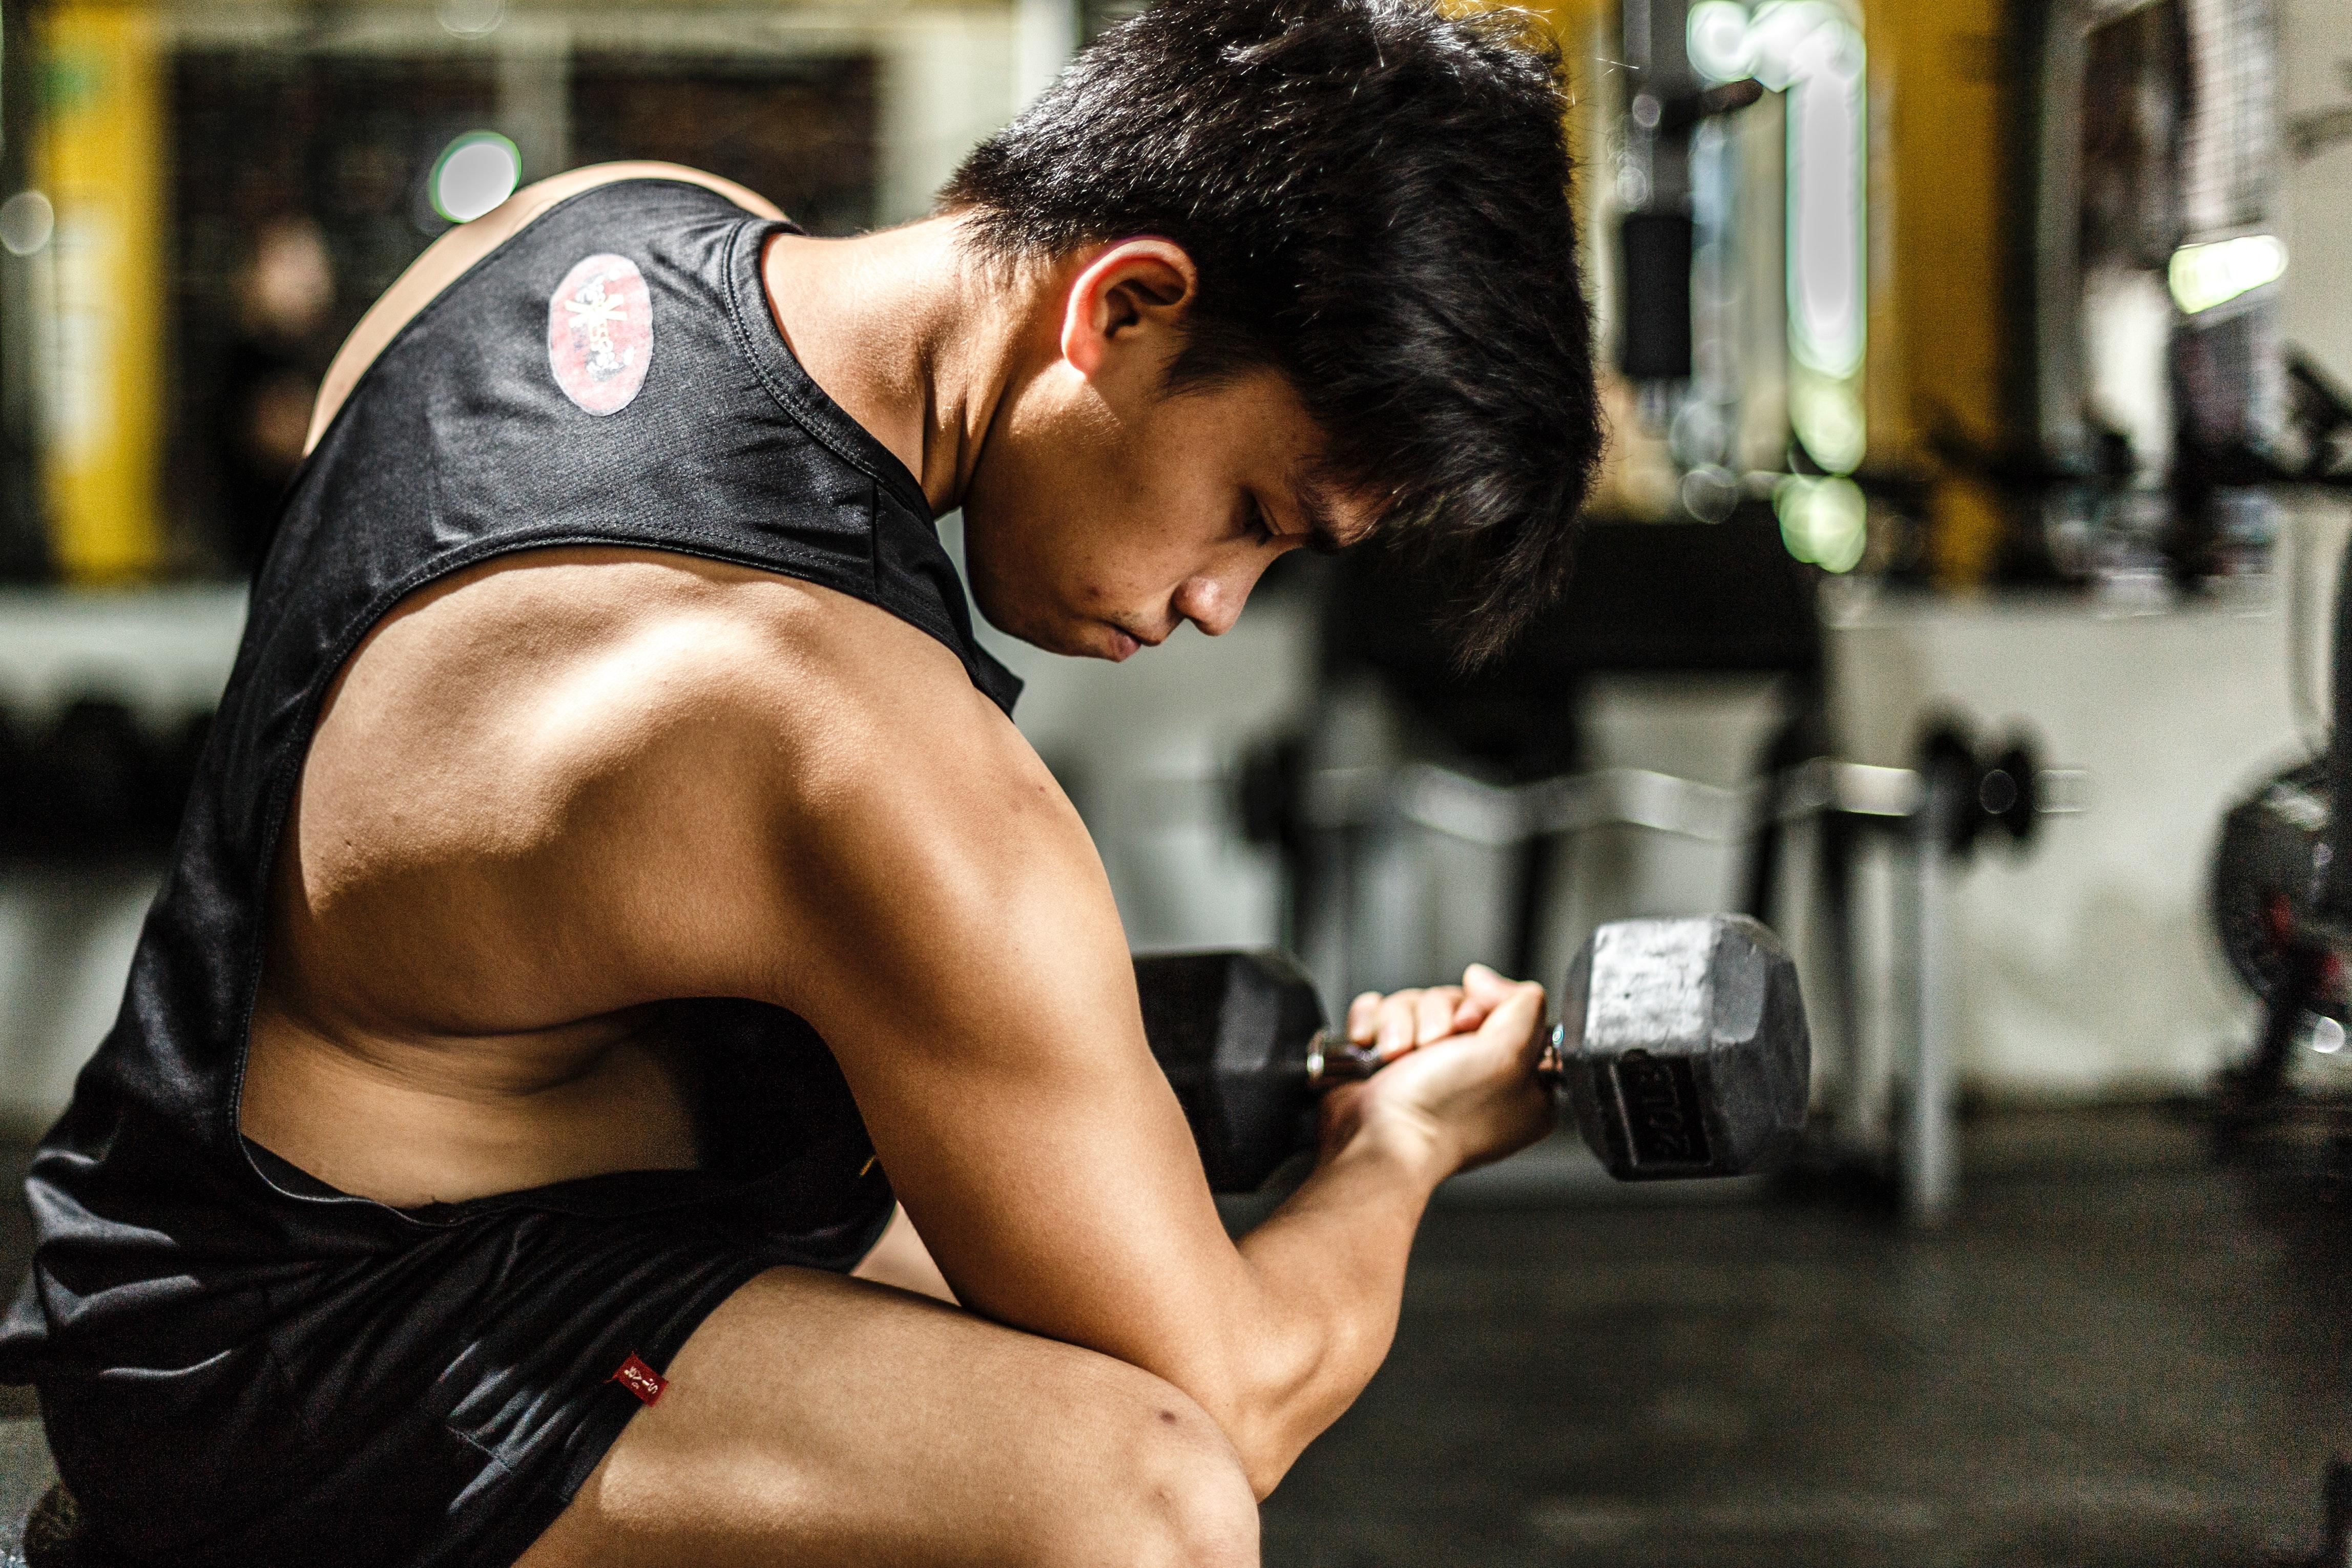 Woman Wearing Black Tank Top Taking Work Out, Athlete, Man, Weights, Wear, HQ Photo